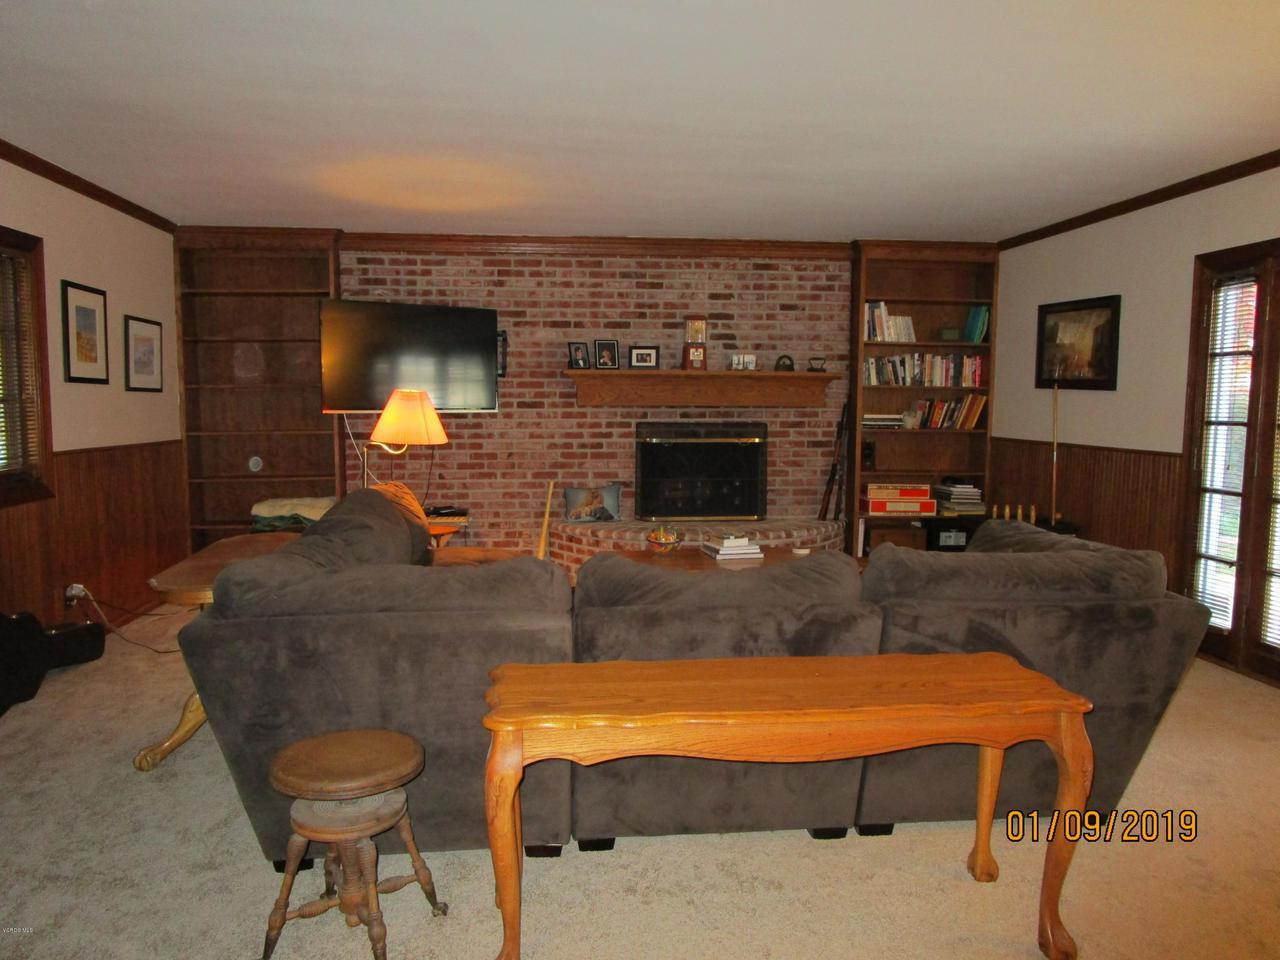 10720 TERNEZ, Moorpark, CA 93021 - Livingroom with Fireplace